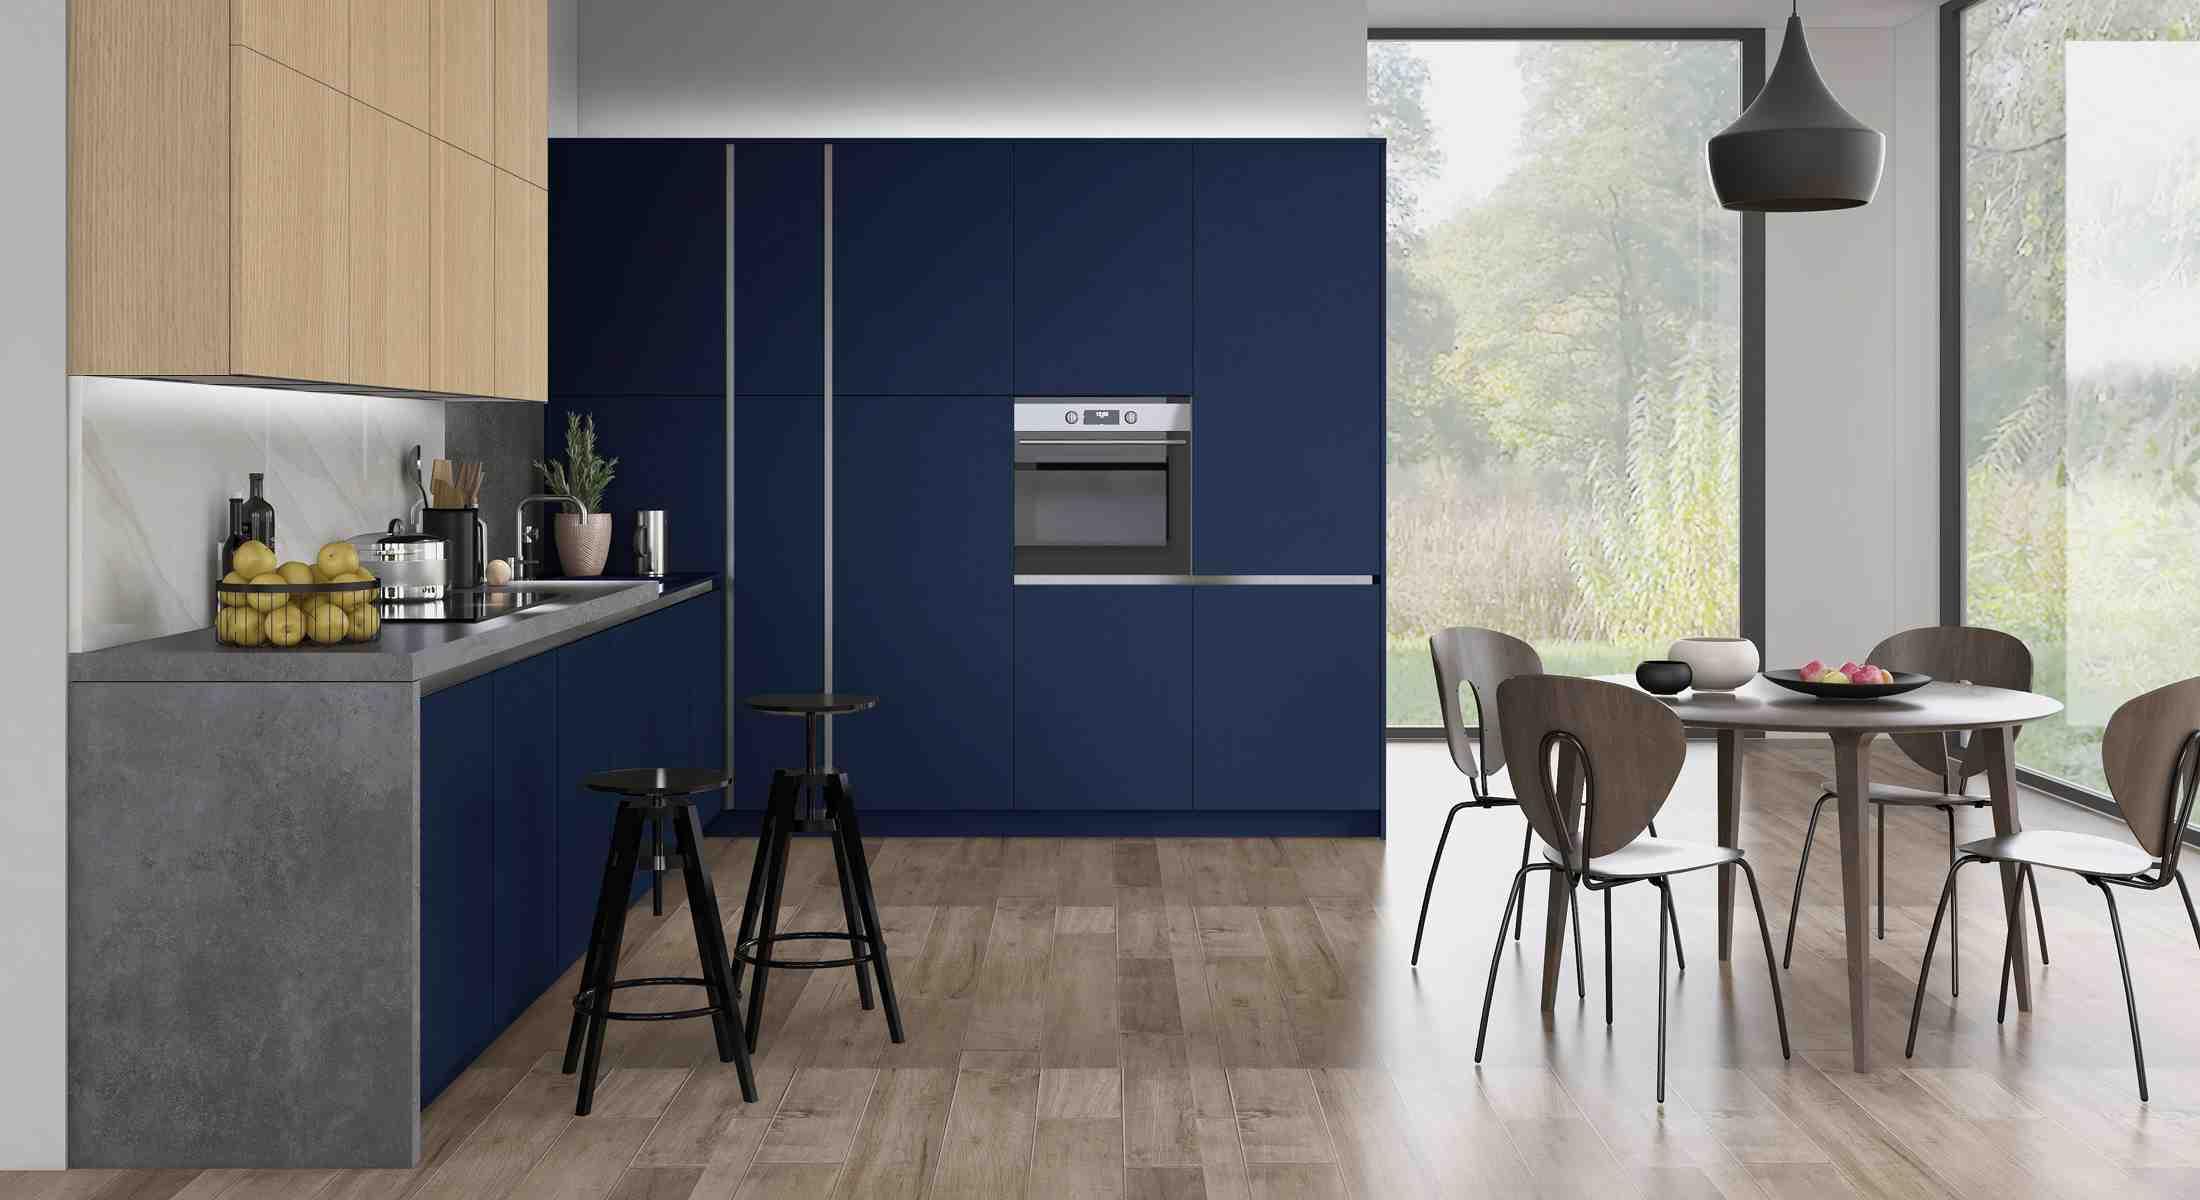 kitchens in burryport, wales by steve williams - vassa matt - true handleless